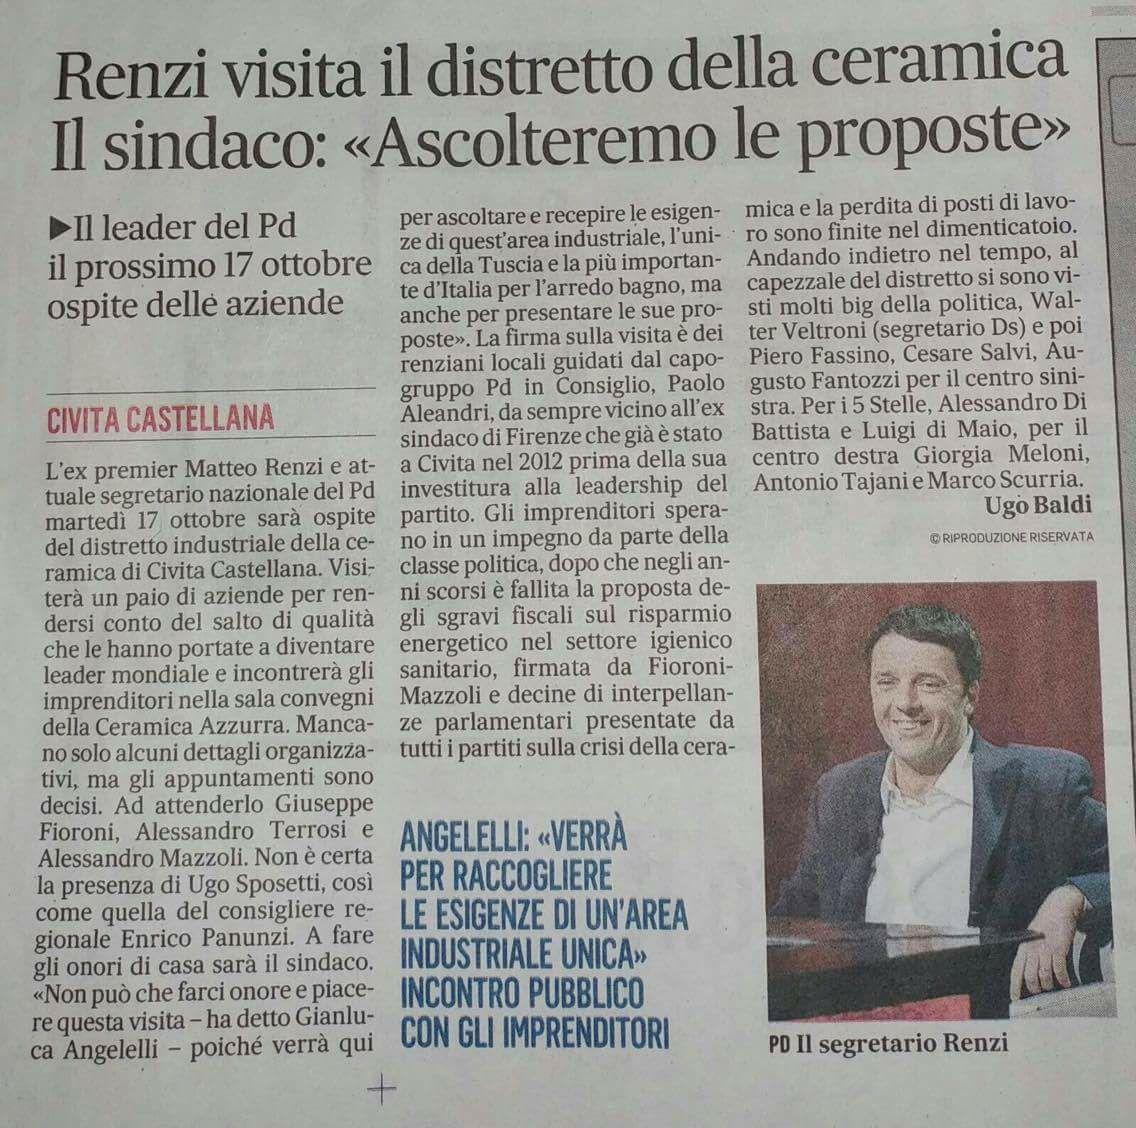 IL SINDACO INFORMA (9 Ottobre 2017)